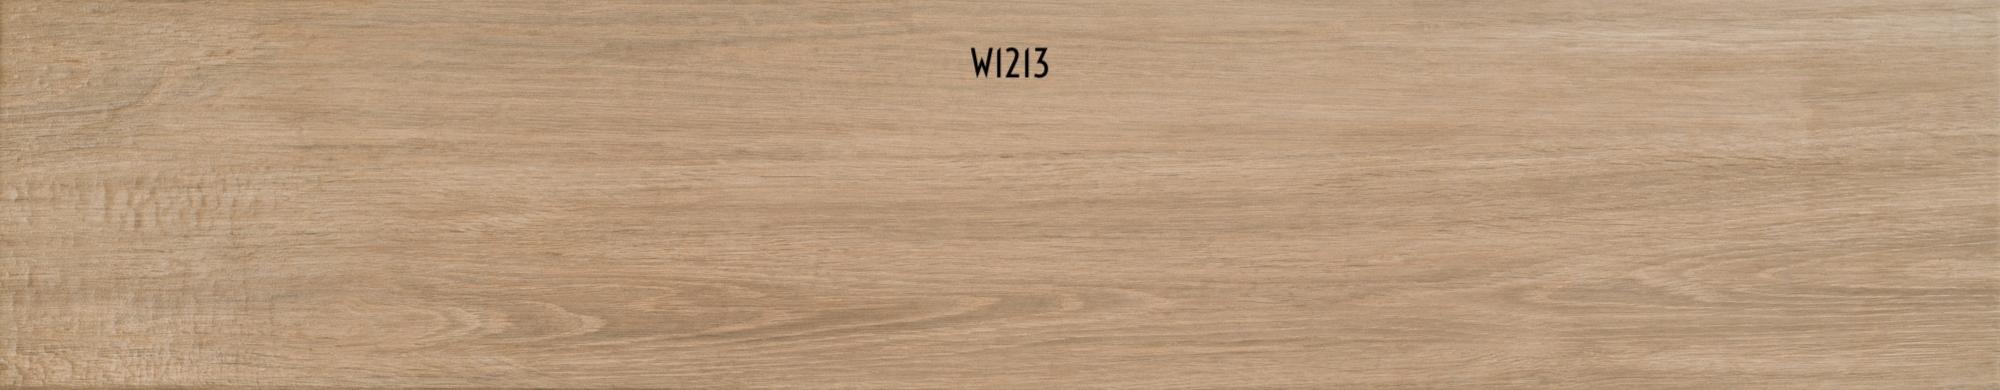 W1213